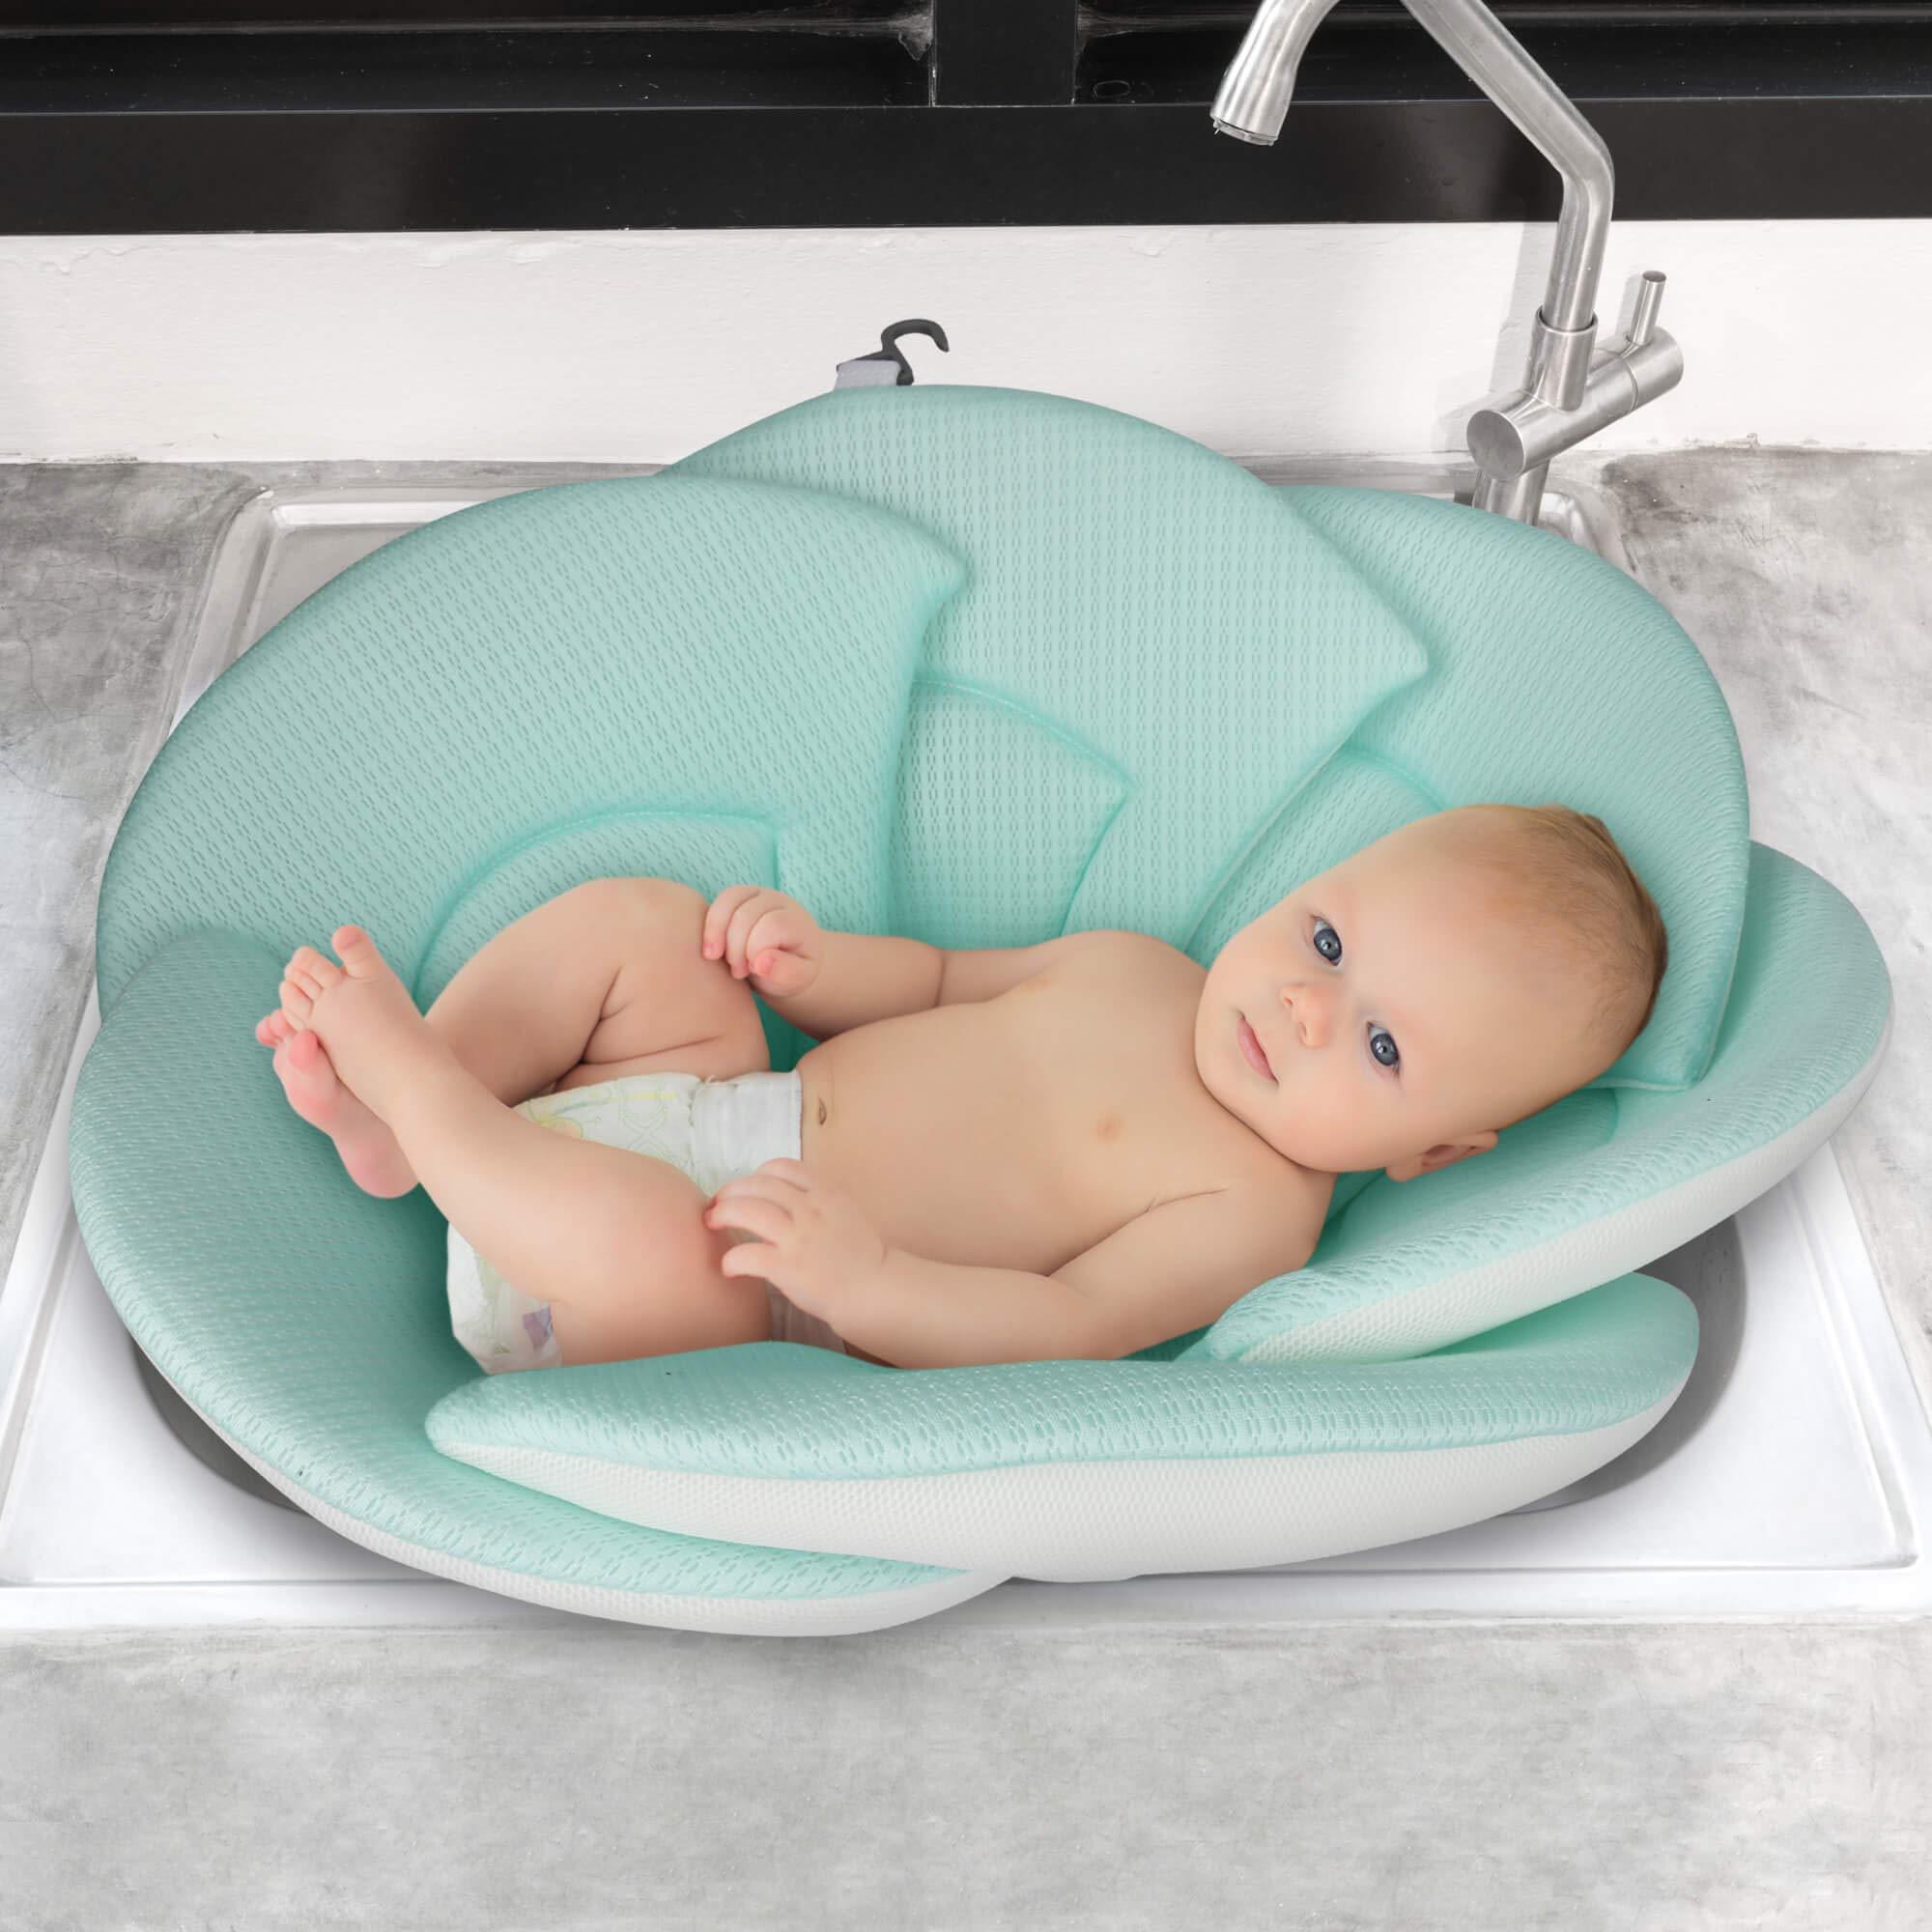 Organic Baby Bath Pillow - Konjac Sponge Included, Blooming Flower for Infant Bathing in Sink, Bathtub or Plastic Bather to Cushion Their Newborn Skin.